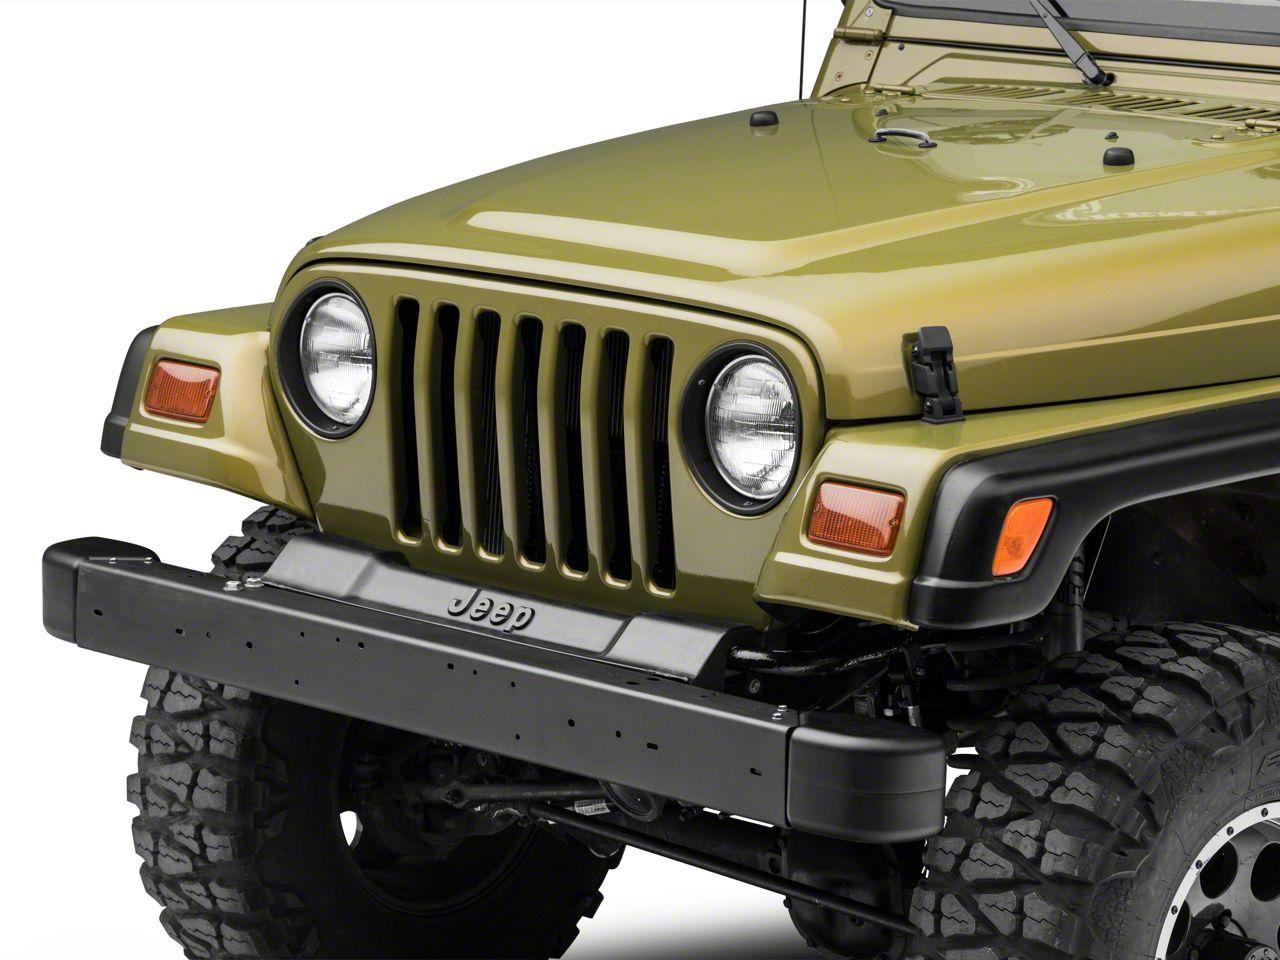 Front Bumper Kit - Black (97-06 Jeep Wrangler TJ)